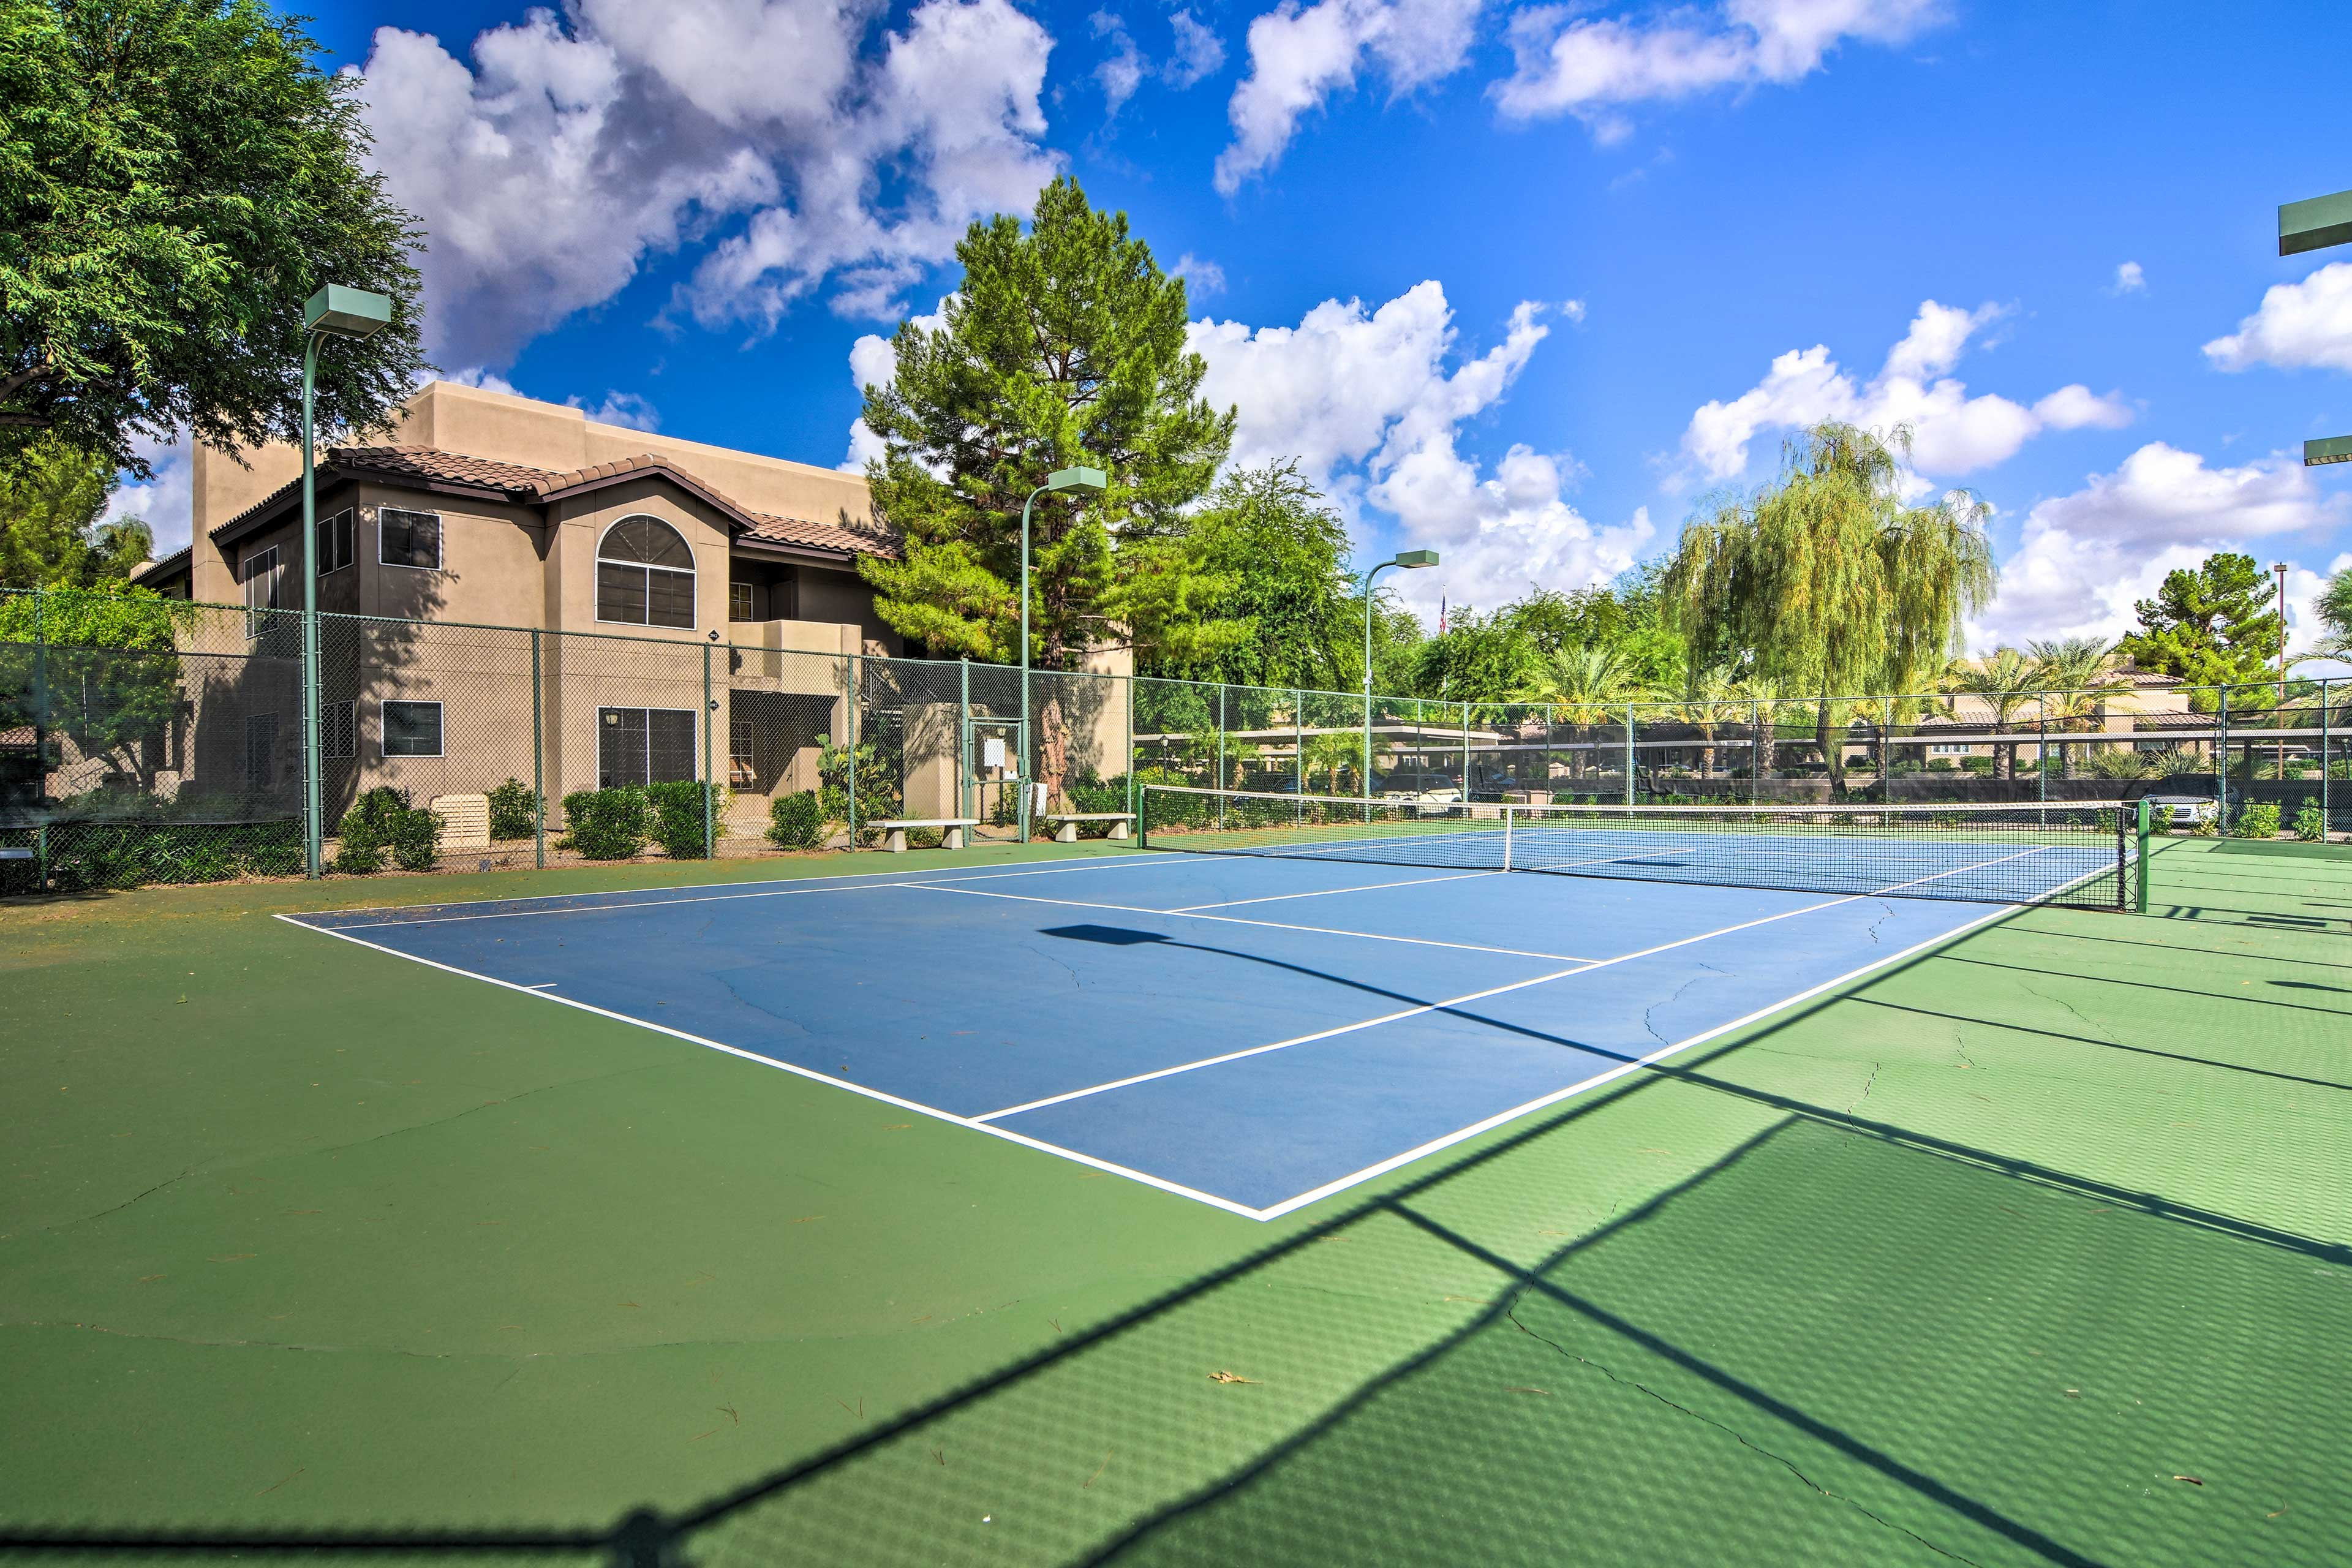 Enjoy a few games of tennis.